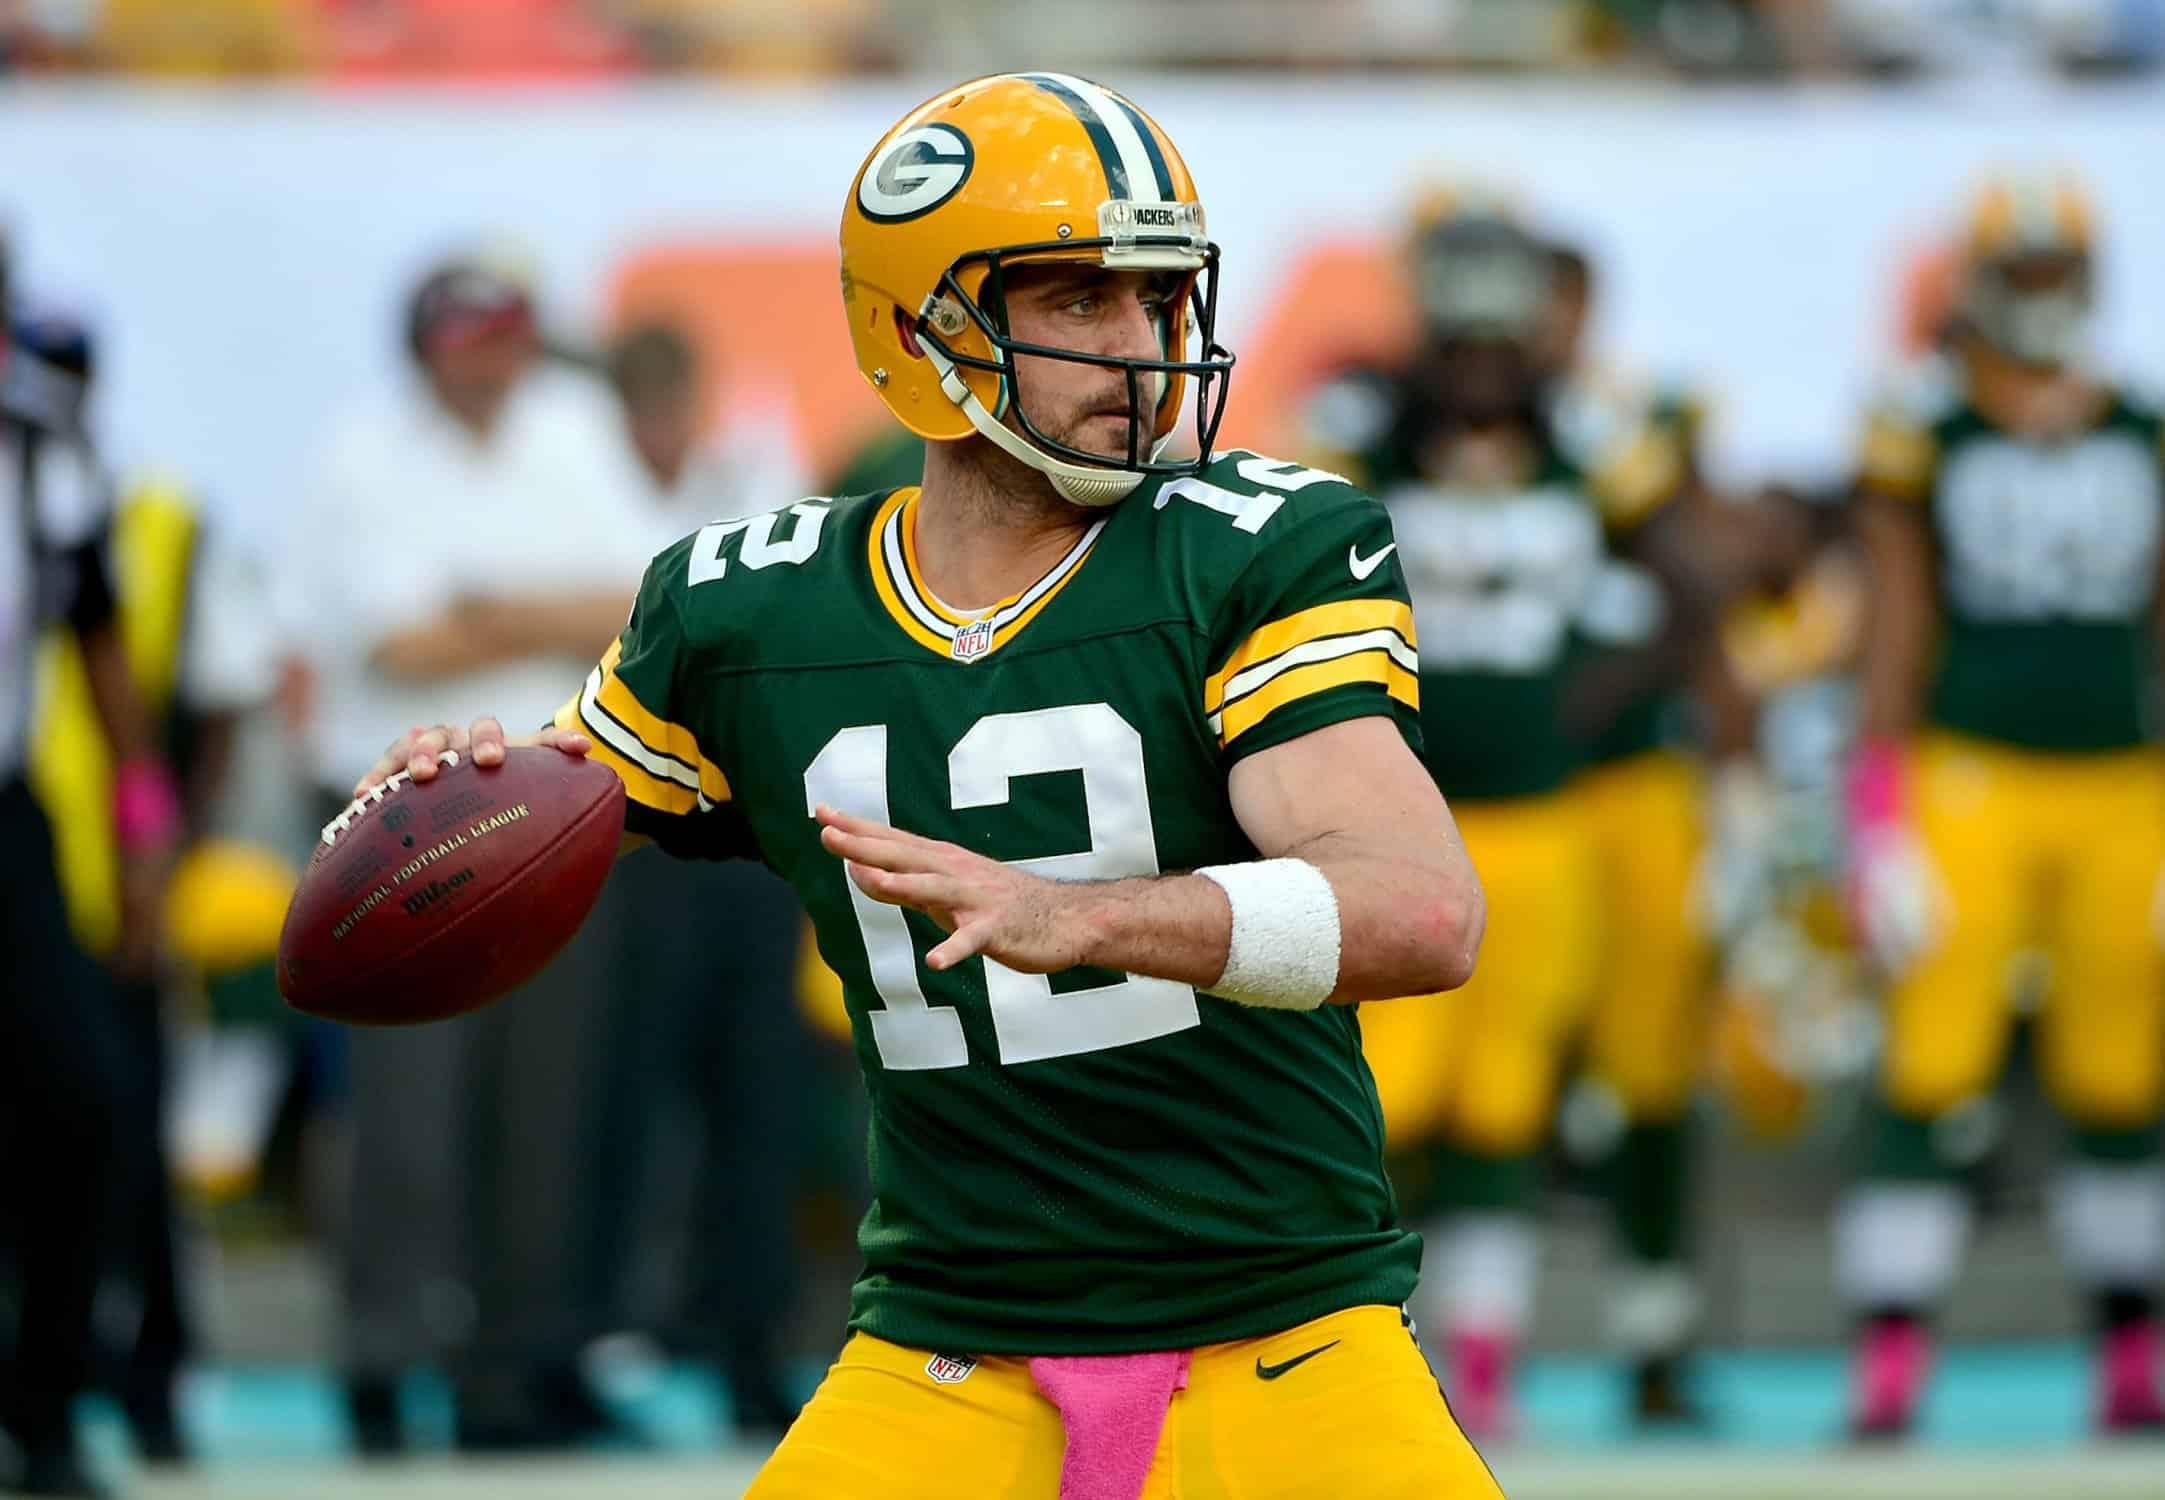 NFC Divisional Weekend Picks: Seattle Seahawks vs Green Bay Packers